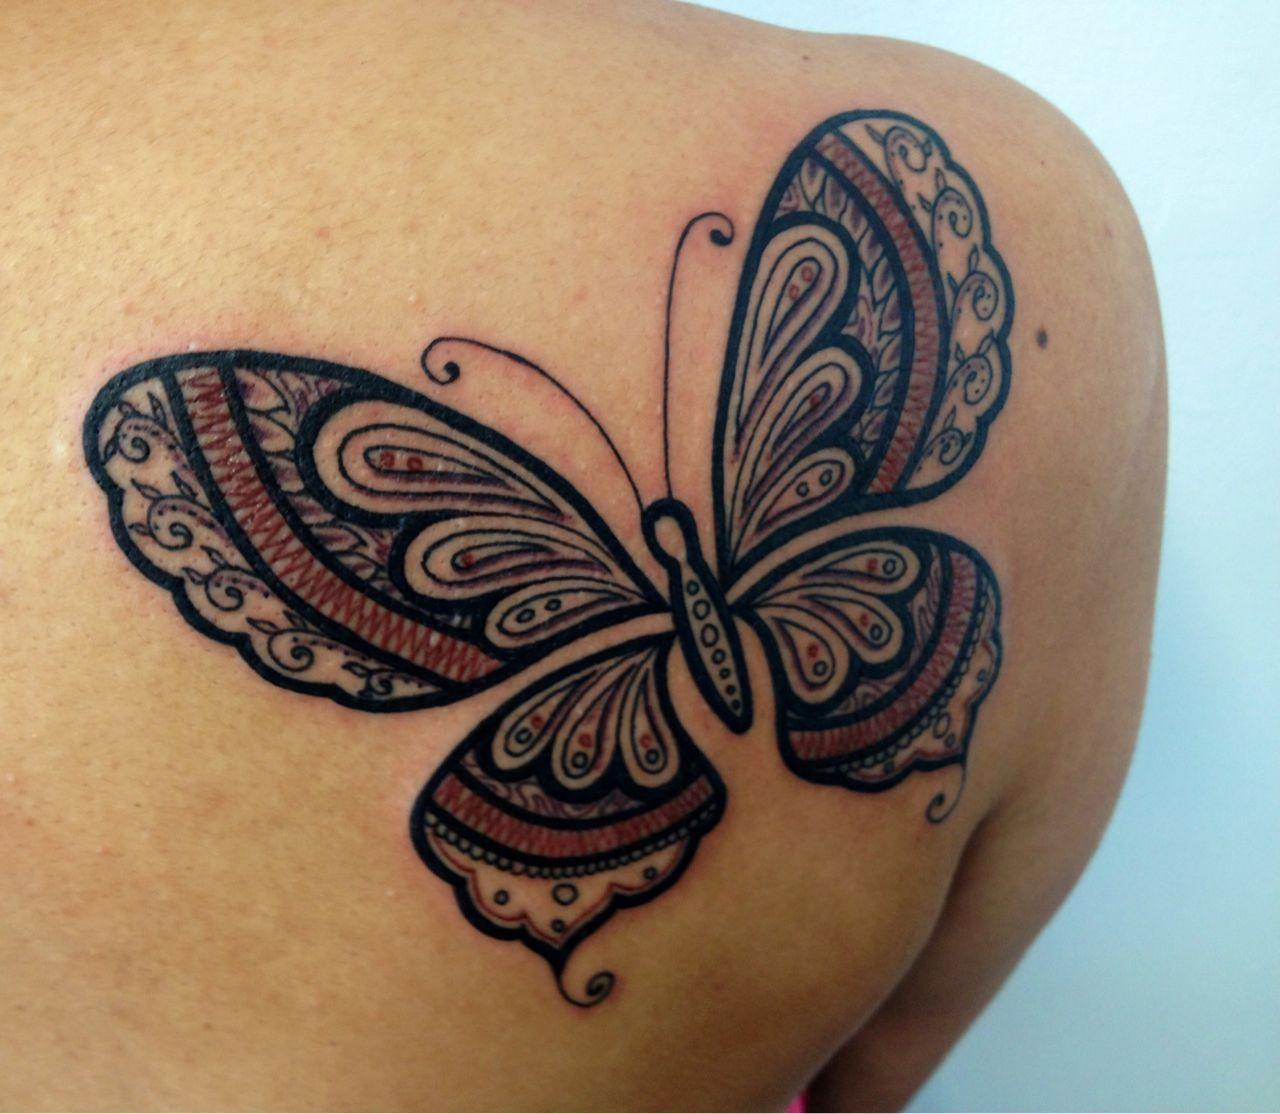 Butterfly Henna Tattoo Designs: Tumblr_mctmxvOkrO1r1d40eo1_1280.jpg (1280×1114) (With